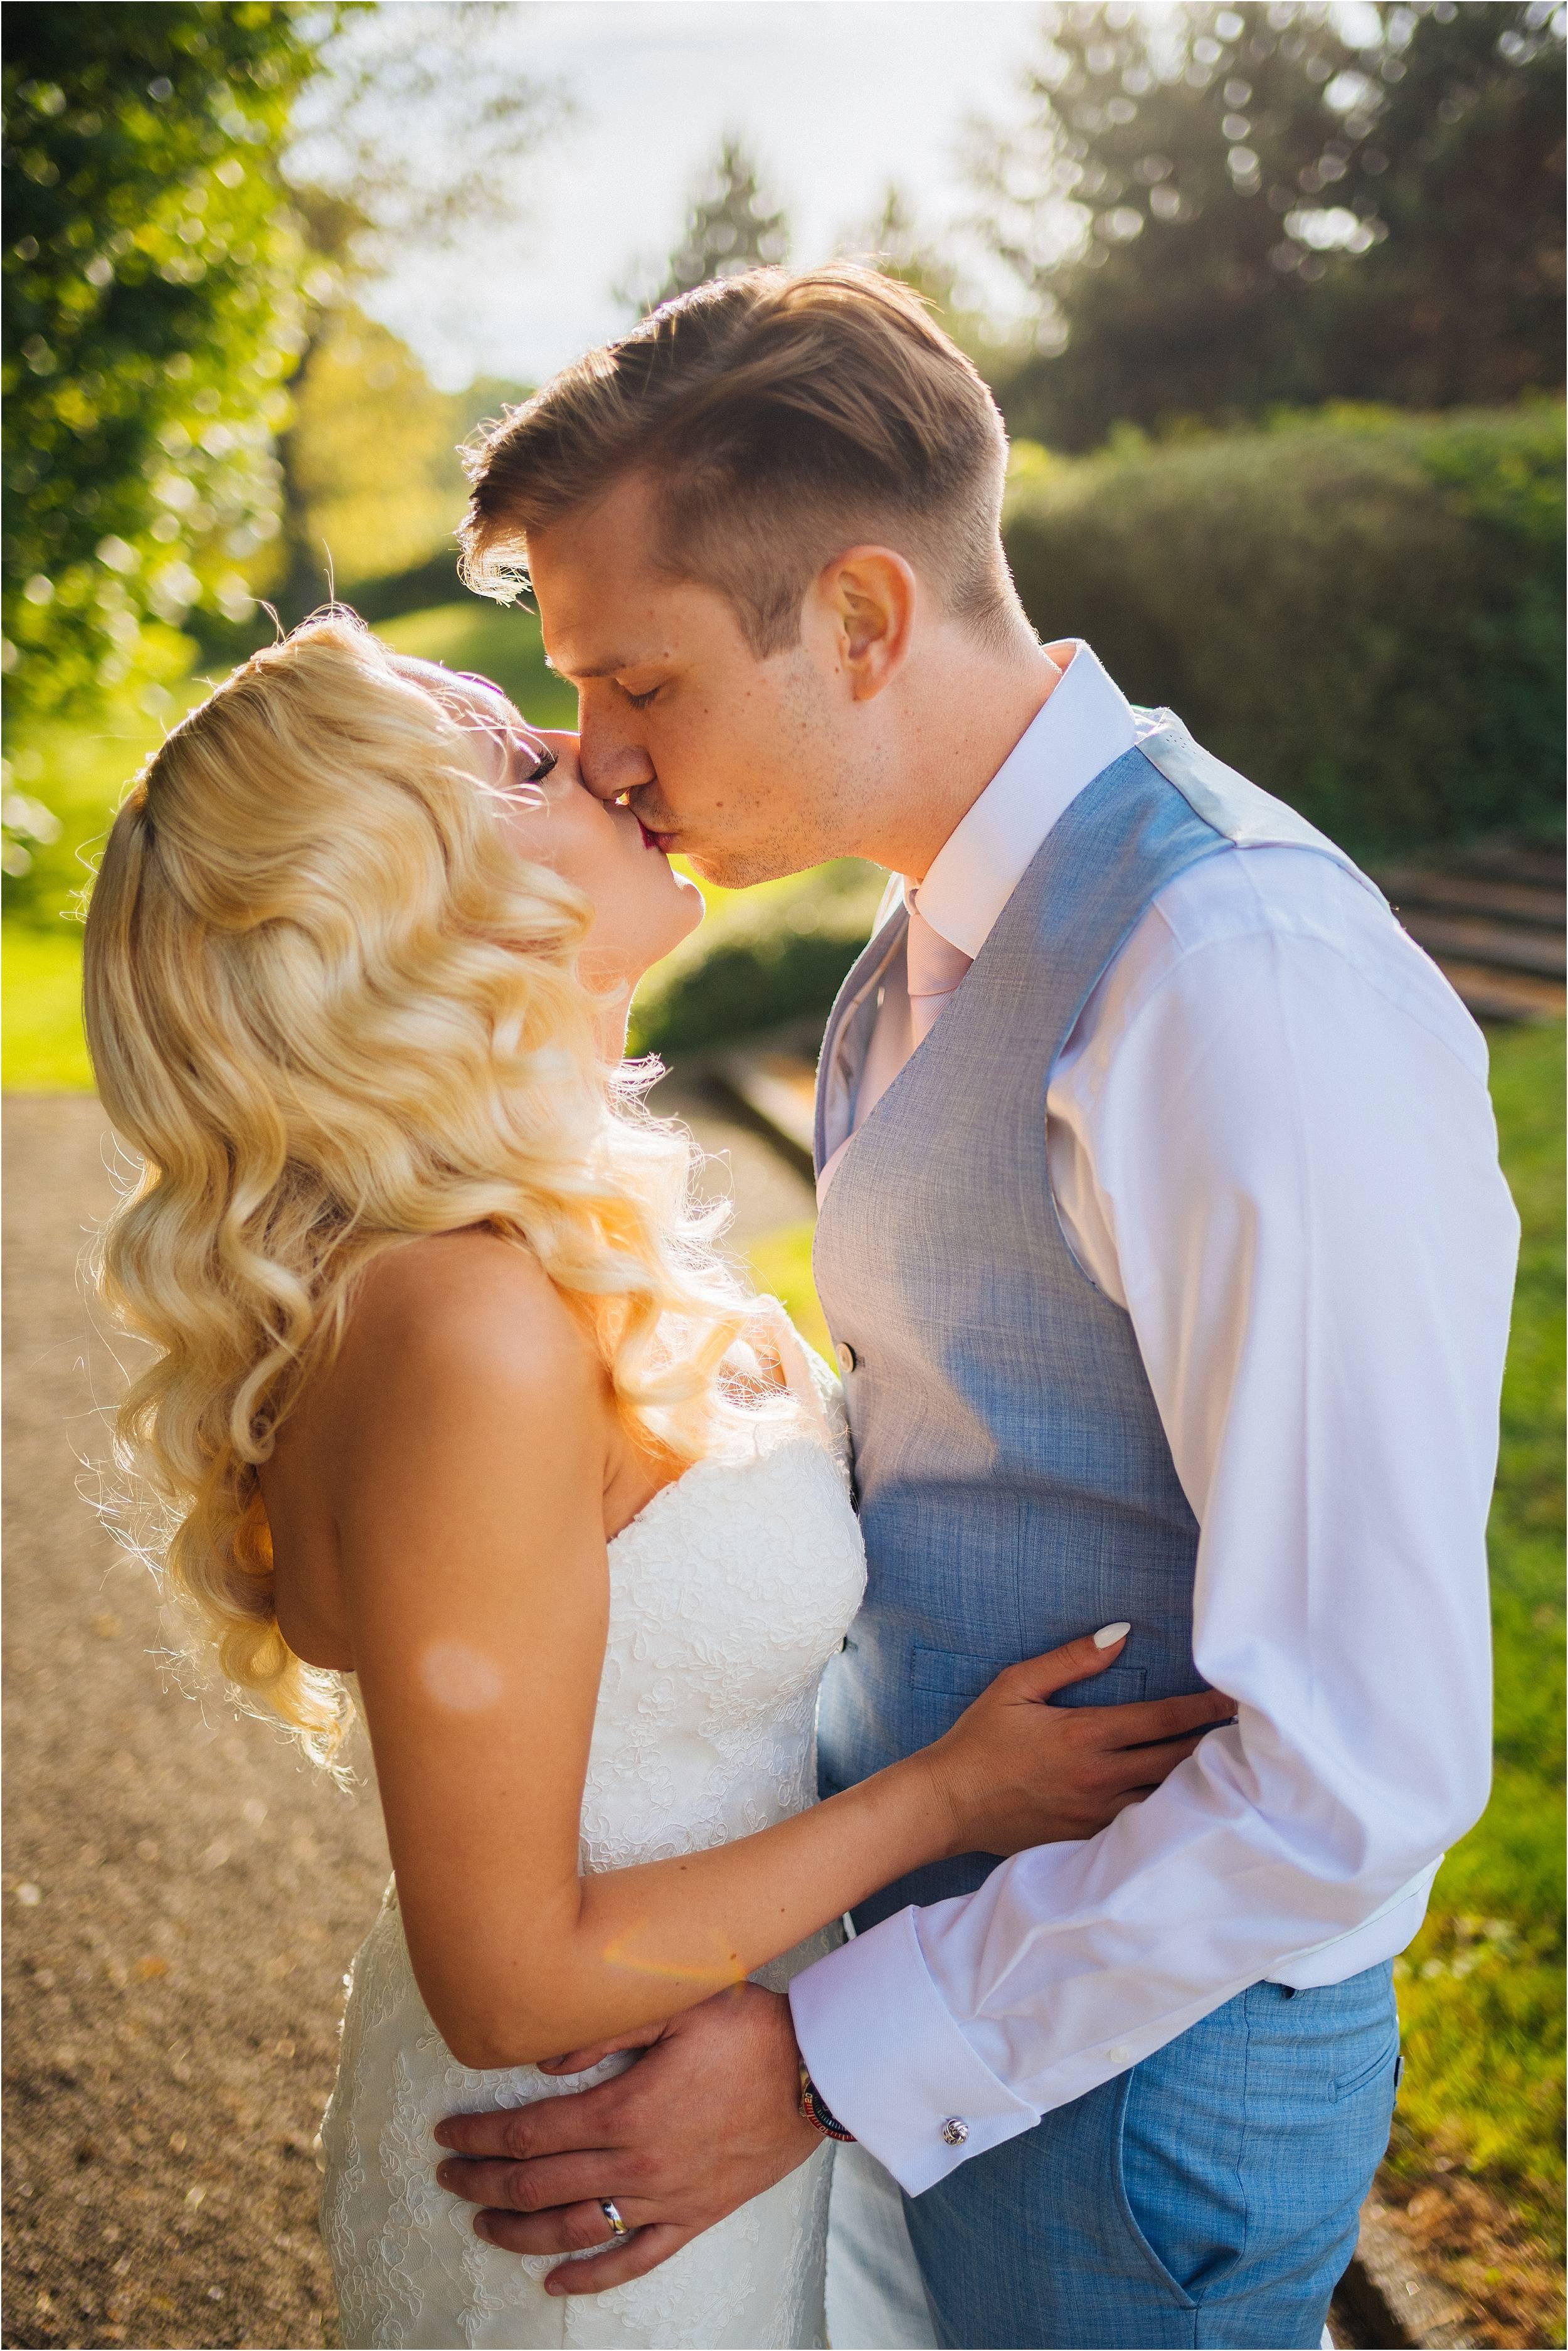 Seaham Hall Wedding Photography_0076.jpg